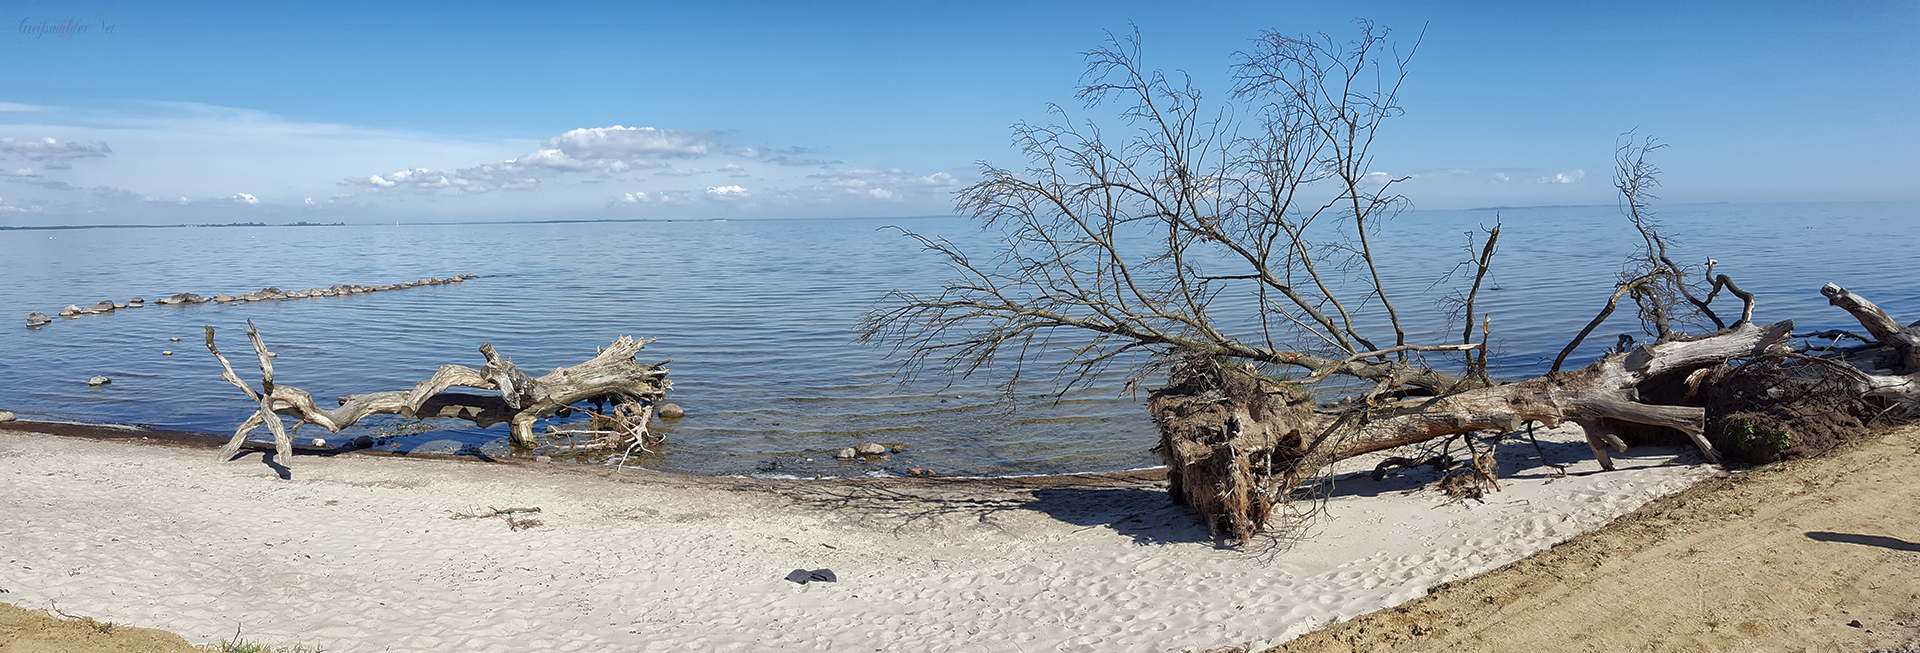 Schlafende Bäume am Strand bei Loissin im Frühling